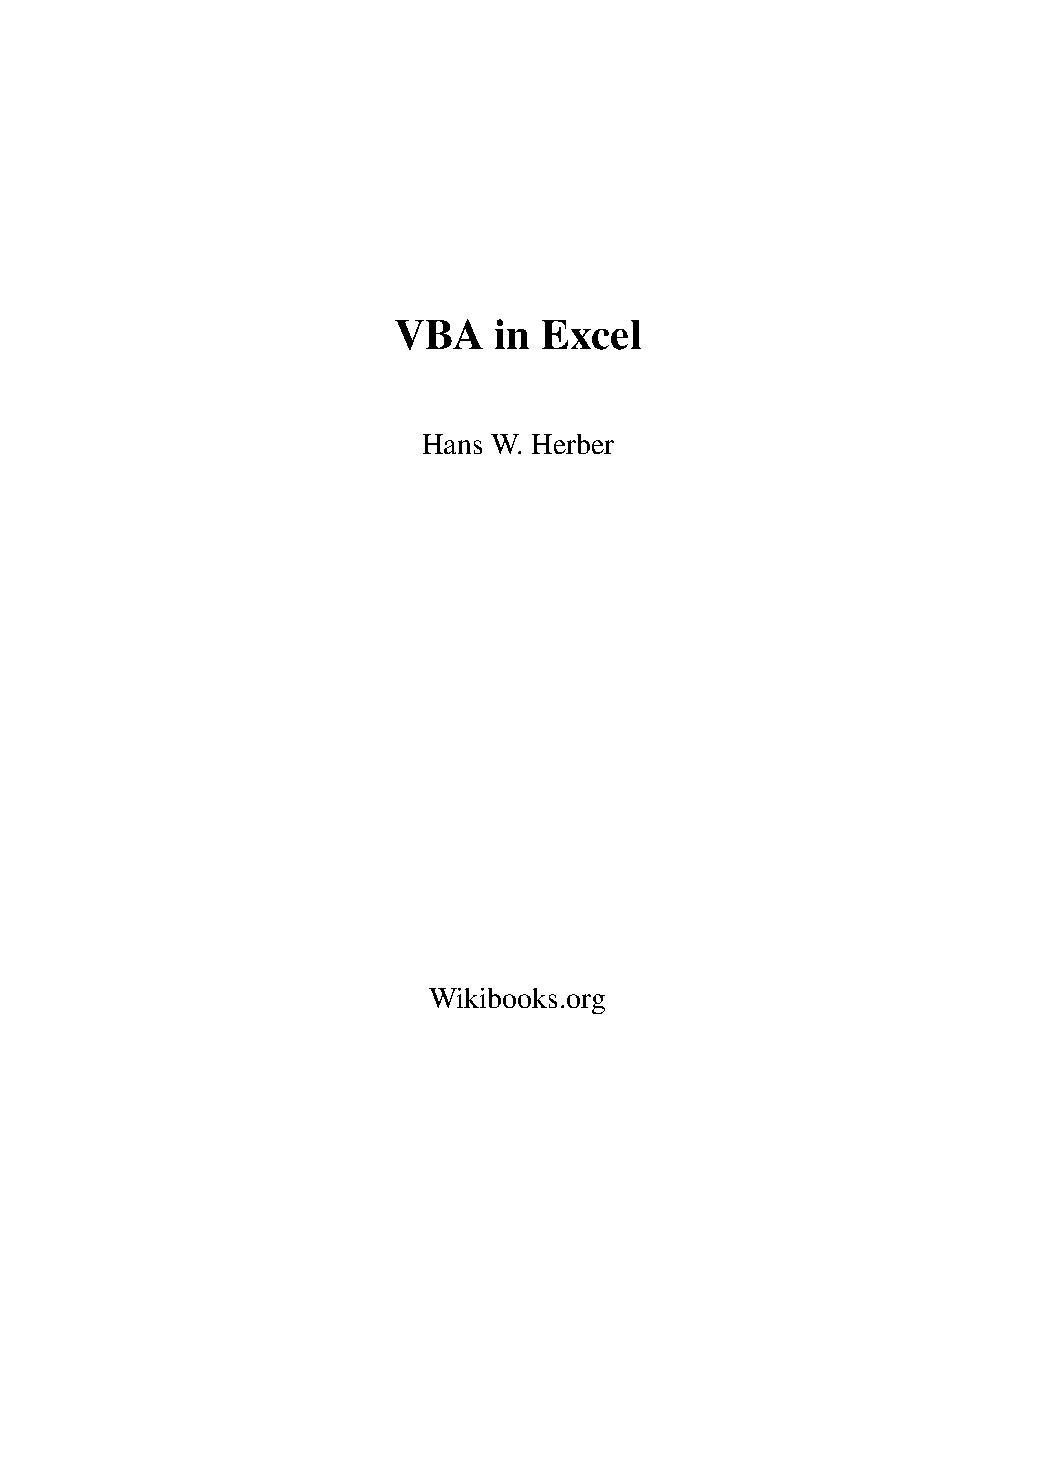 advanced excel 2010 tutorial pdf free download